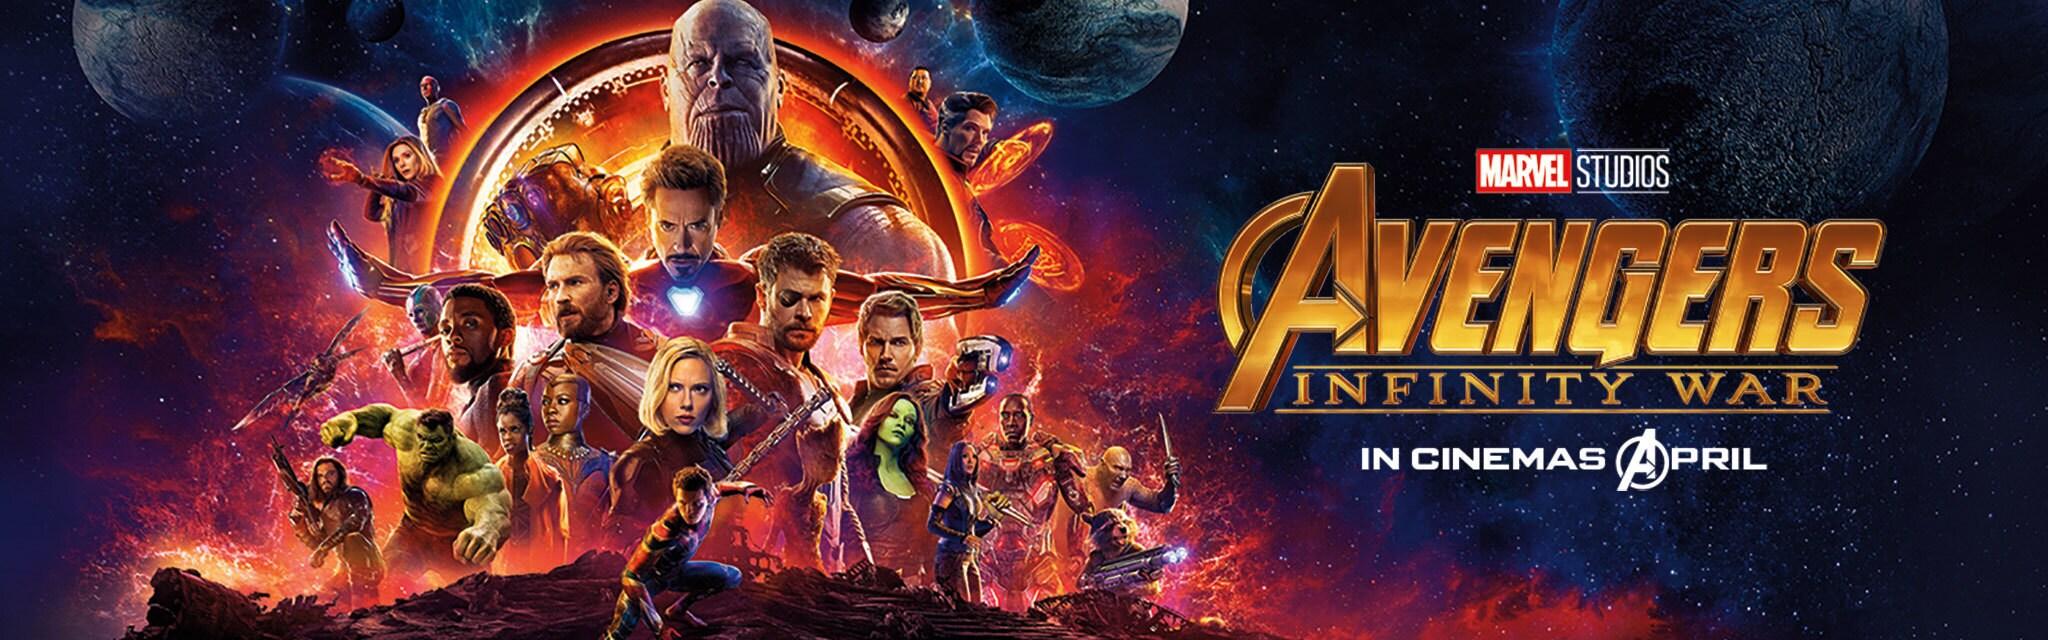 Marvel Avengers: Infinity War - Coming soon